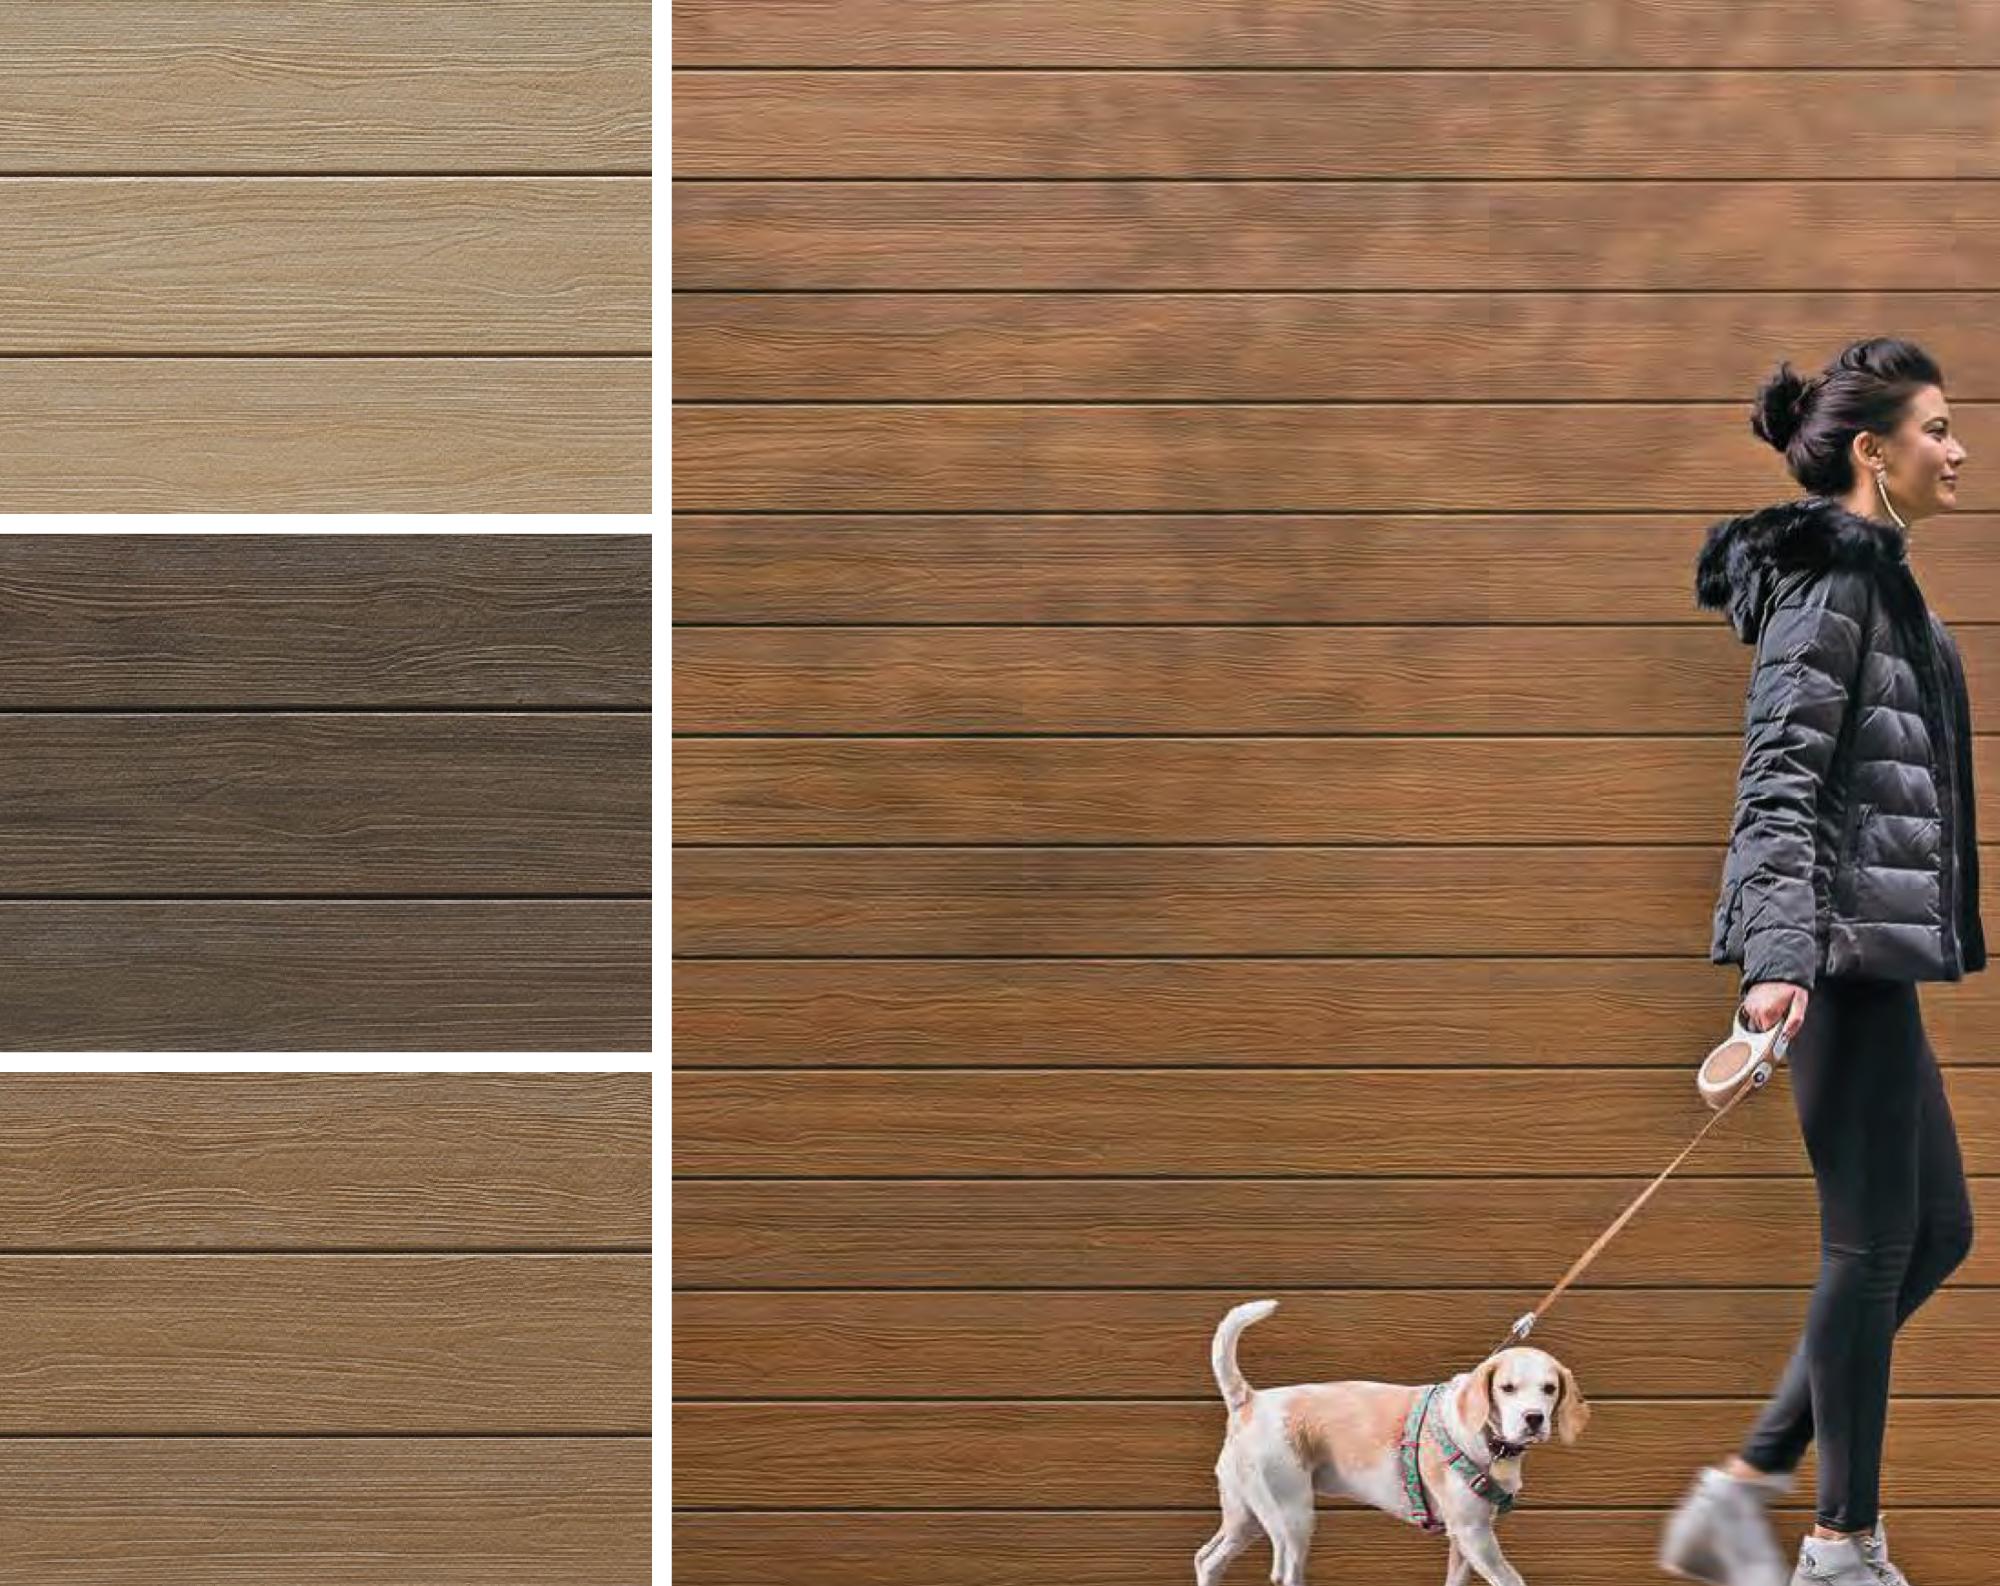 Ceraclad Urban Cedar Style Faux Wood Fiber Cement Façades